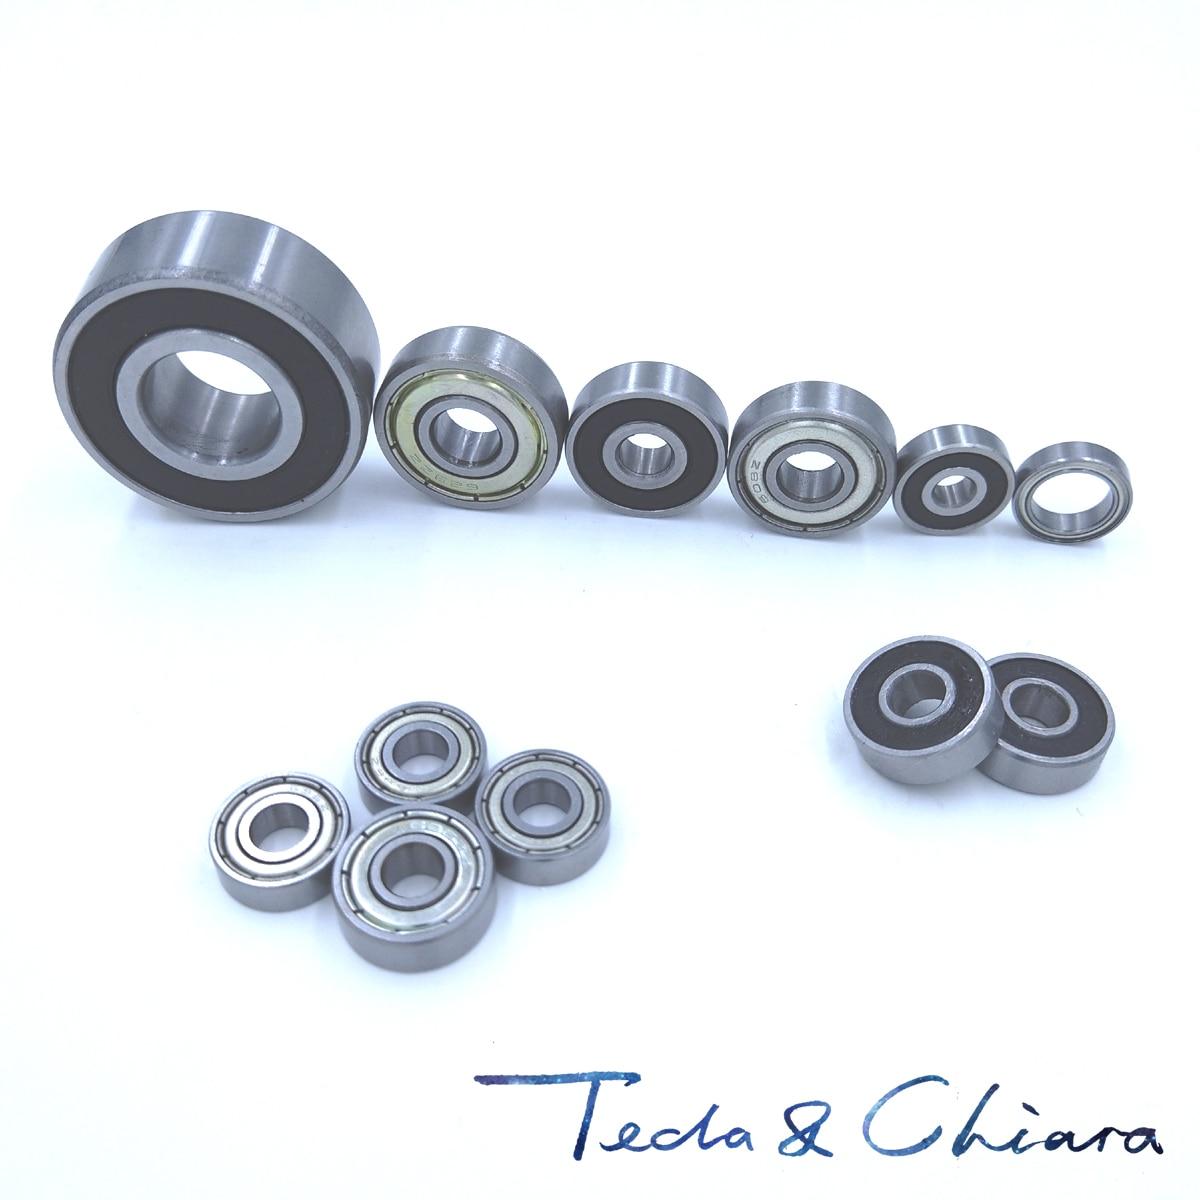 6900 6900ZZ 6900RS 6900-2Z 6900Z 6900-2RS ZZ RS RZ 2RZ Deep Groove Ball Bearings 10 X 22 X 6mm